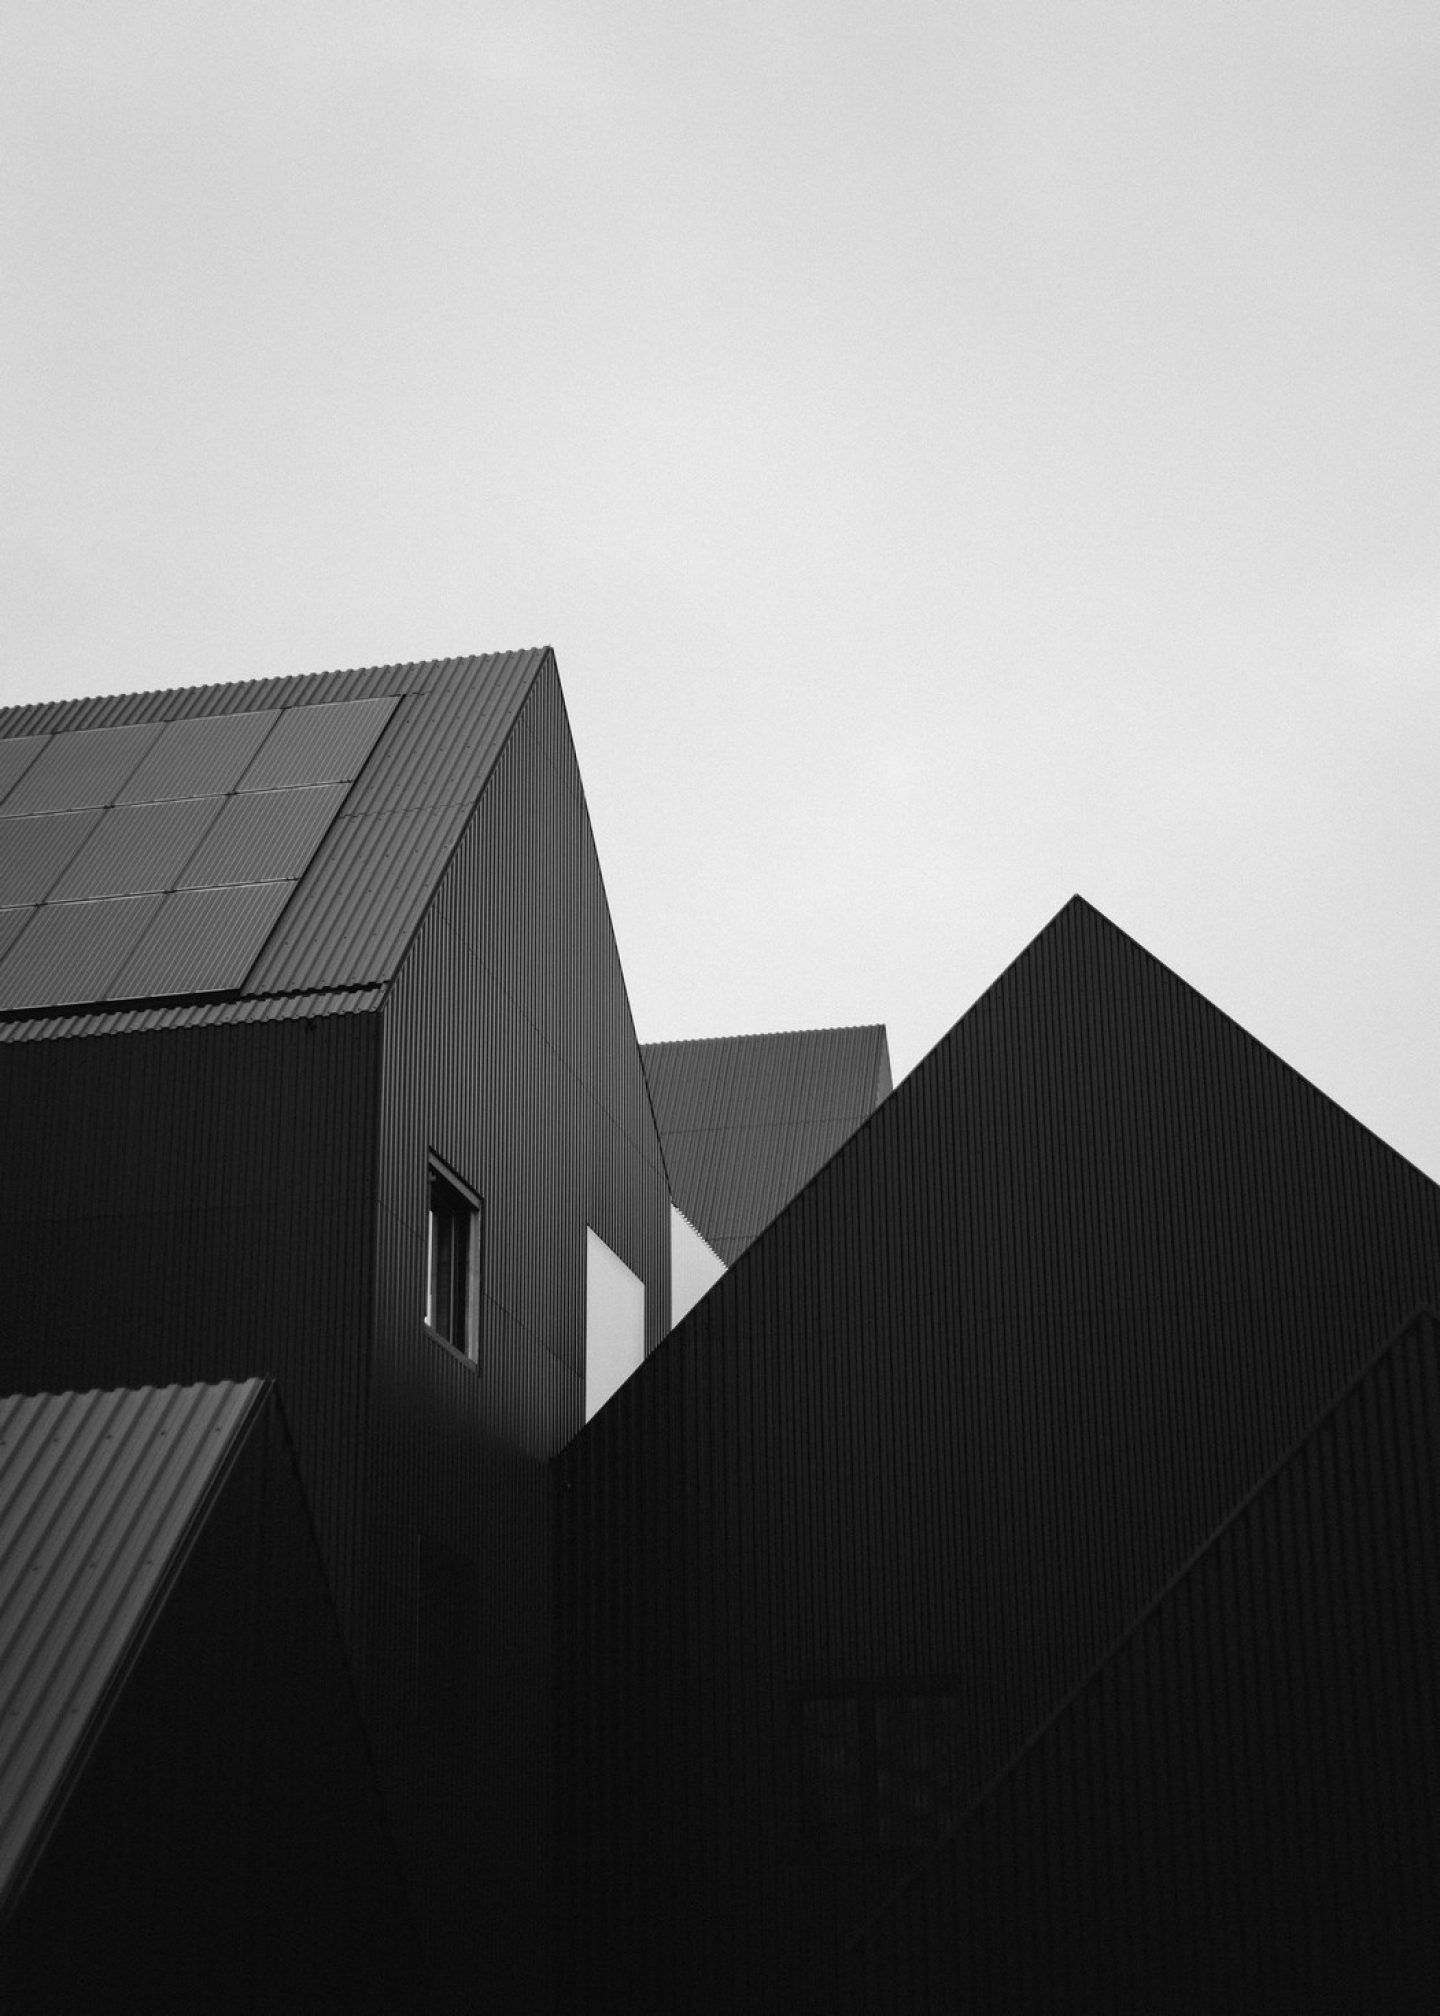 kim_holtermand_architecture-9-kopiowanie